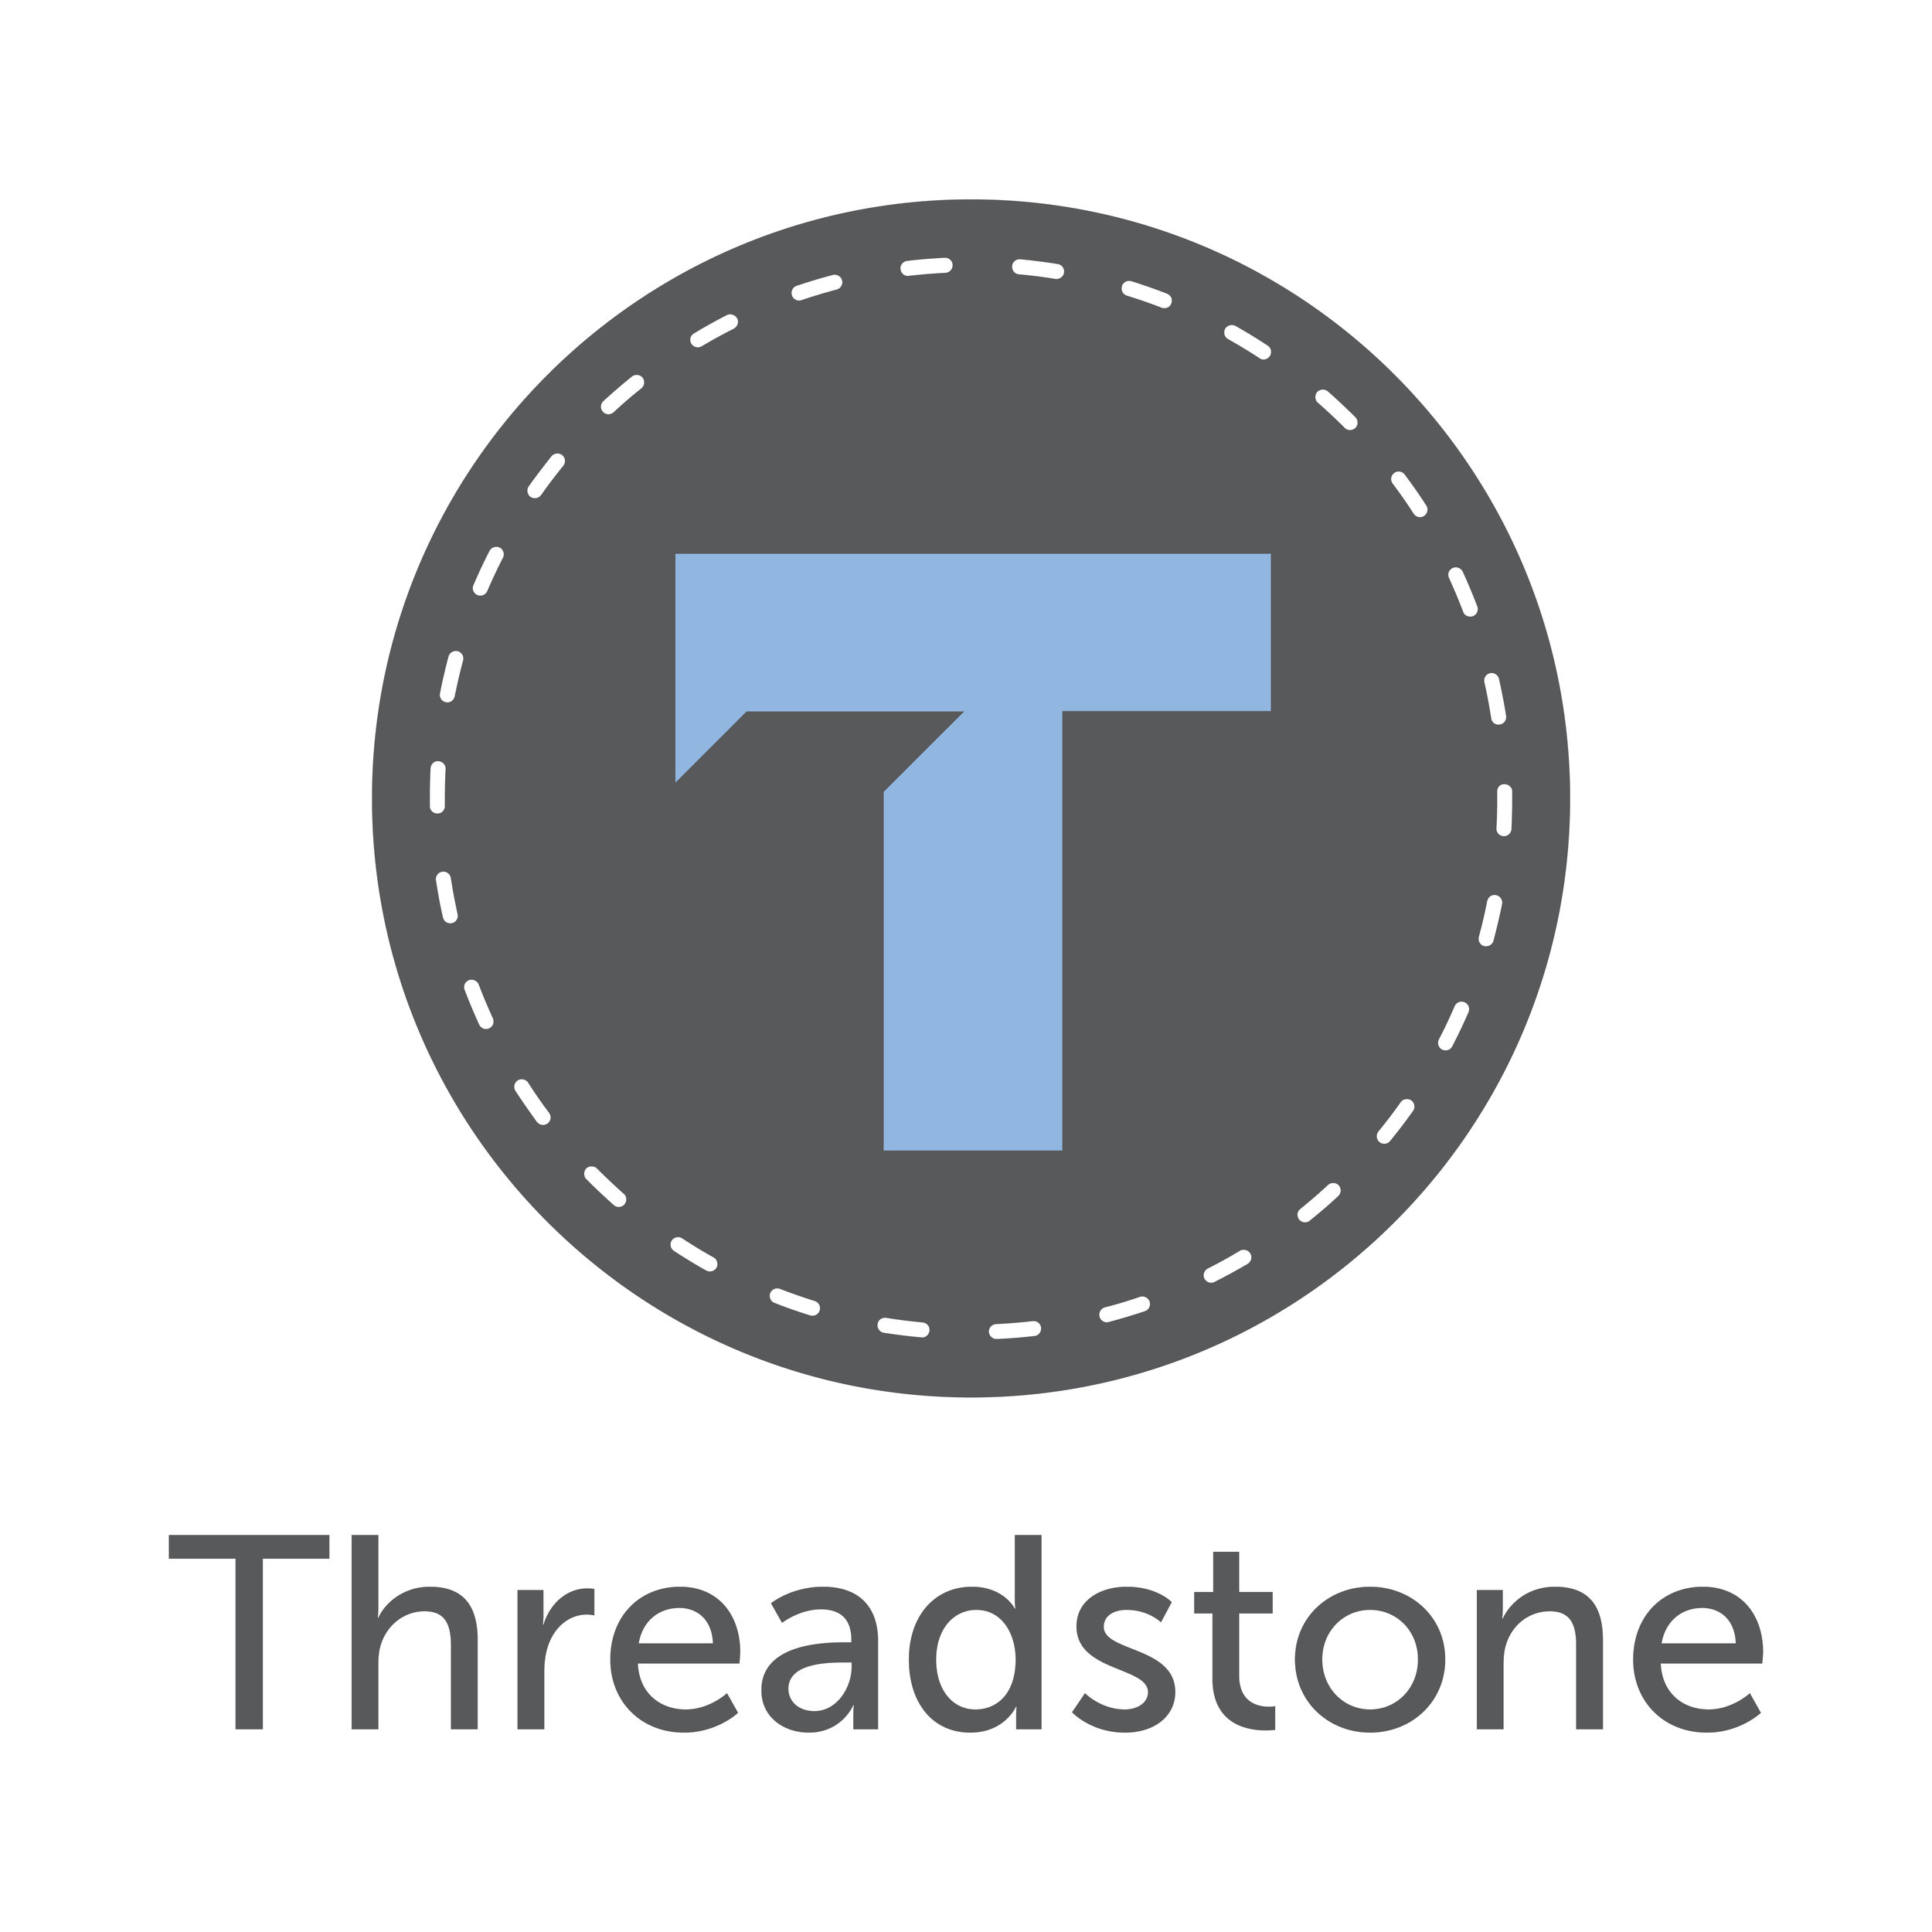 threadstone-01.jpg